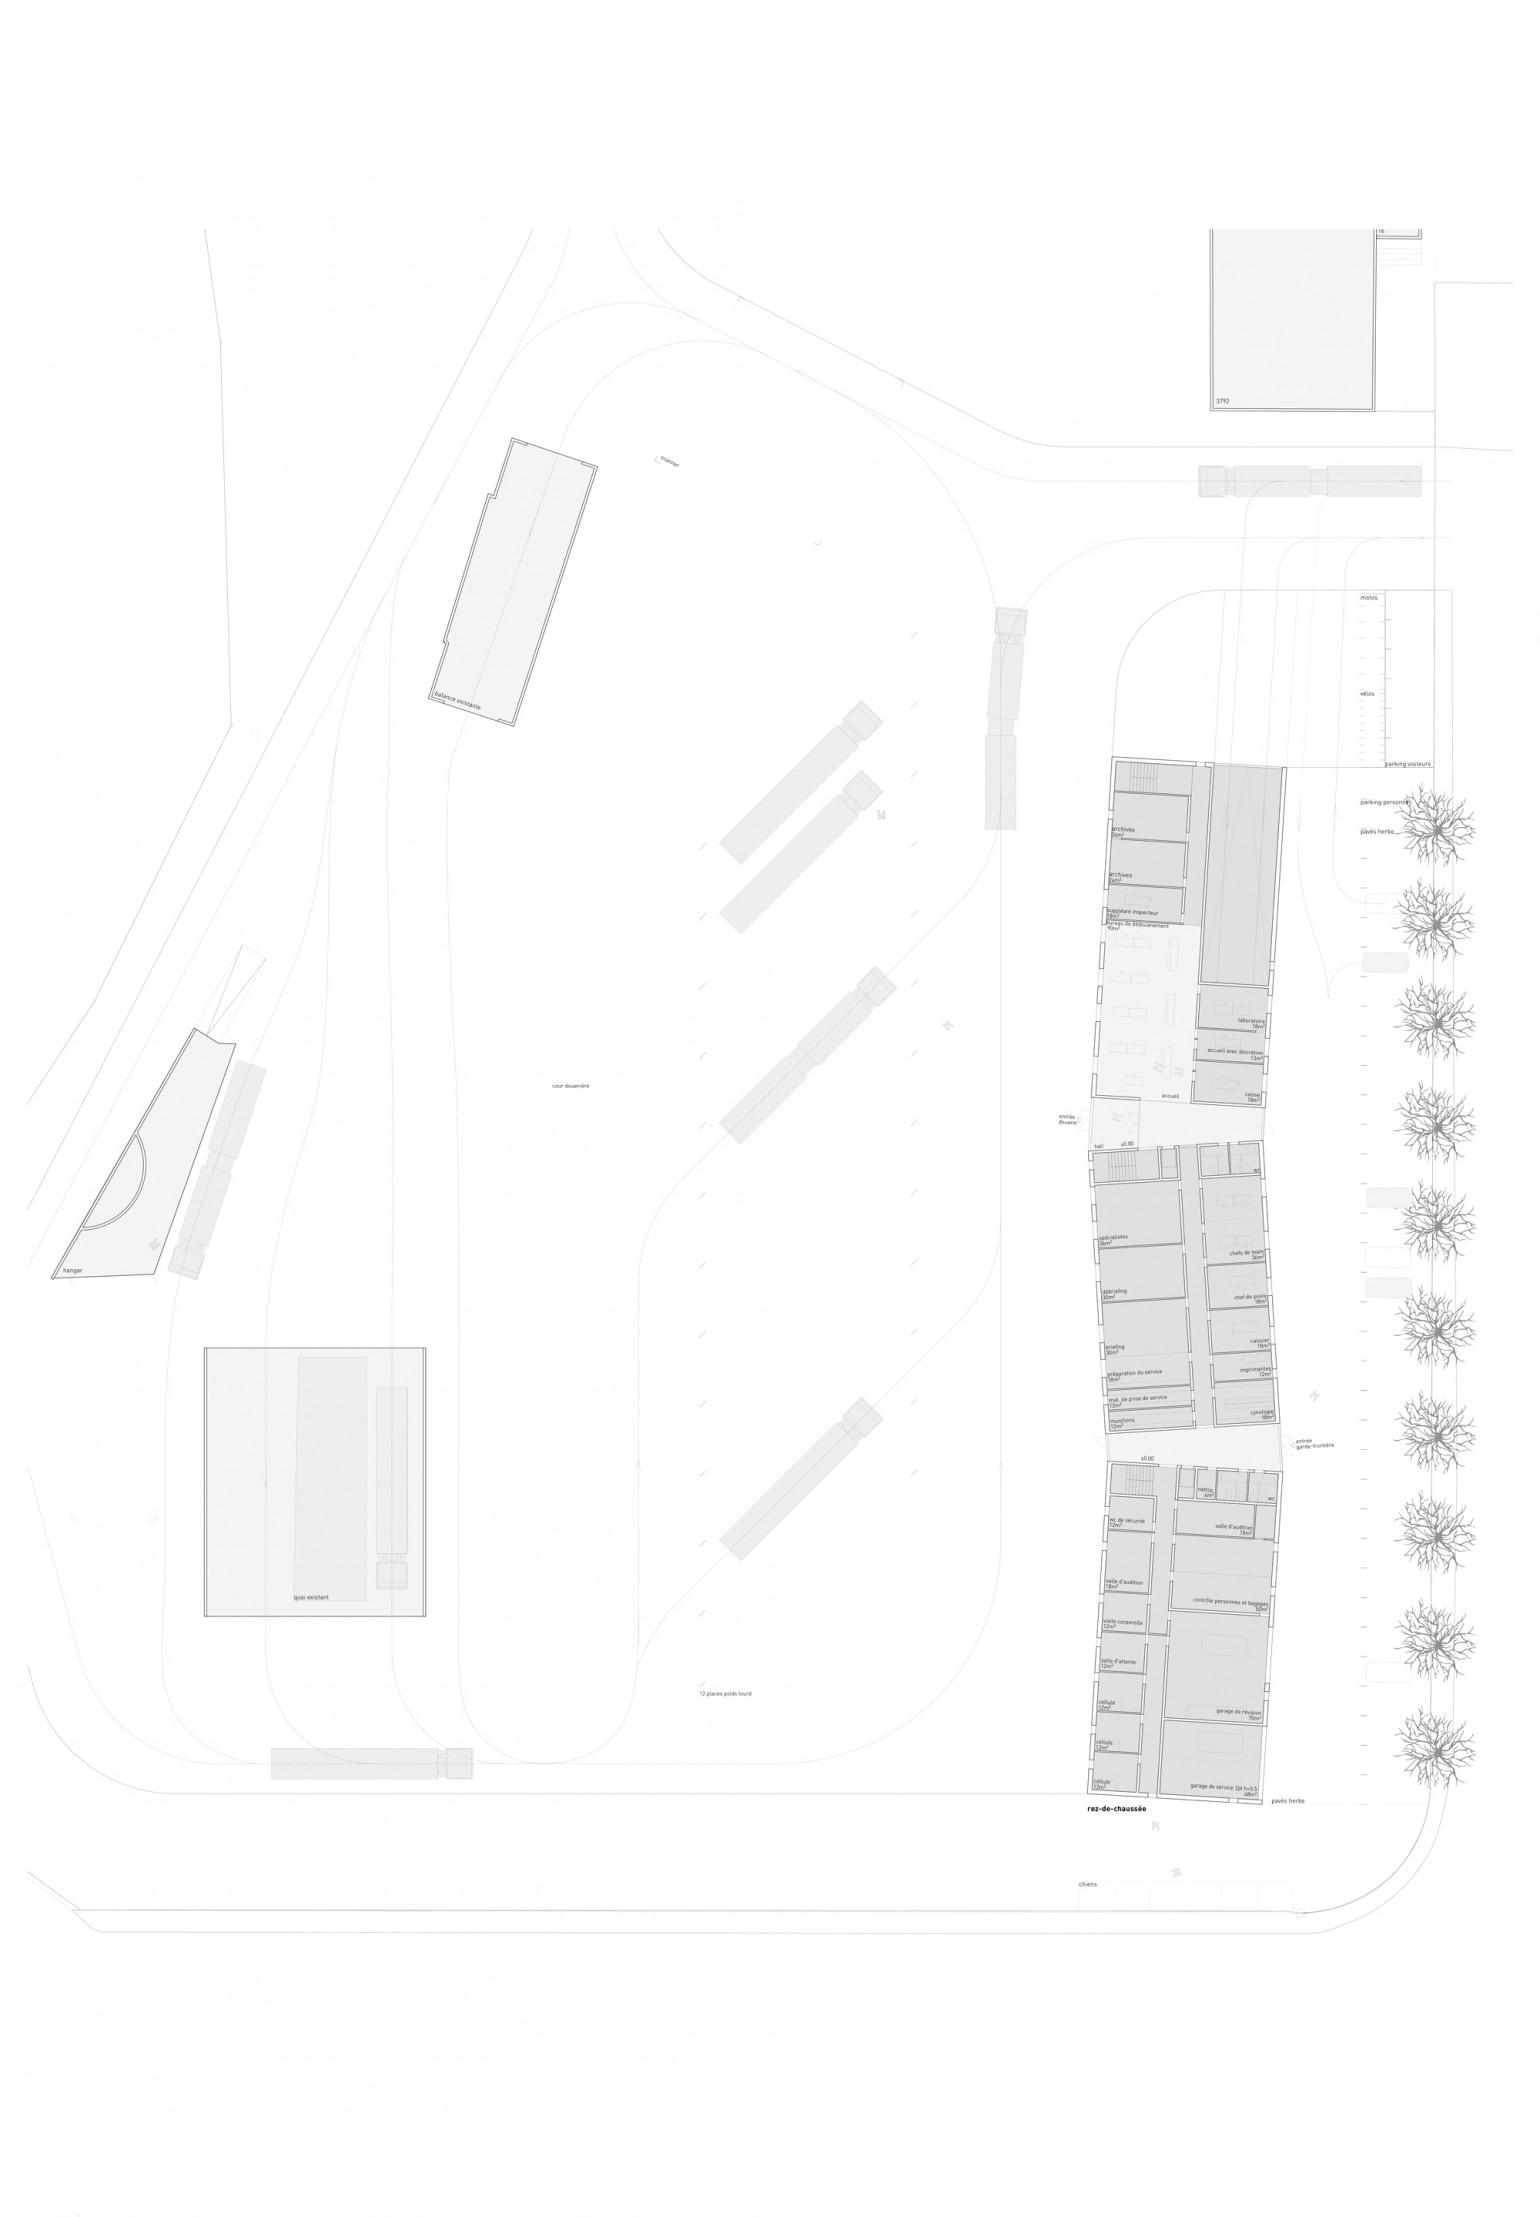 douane_martigny_meyer_architecture_sion_01